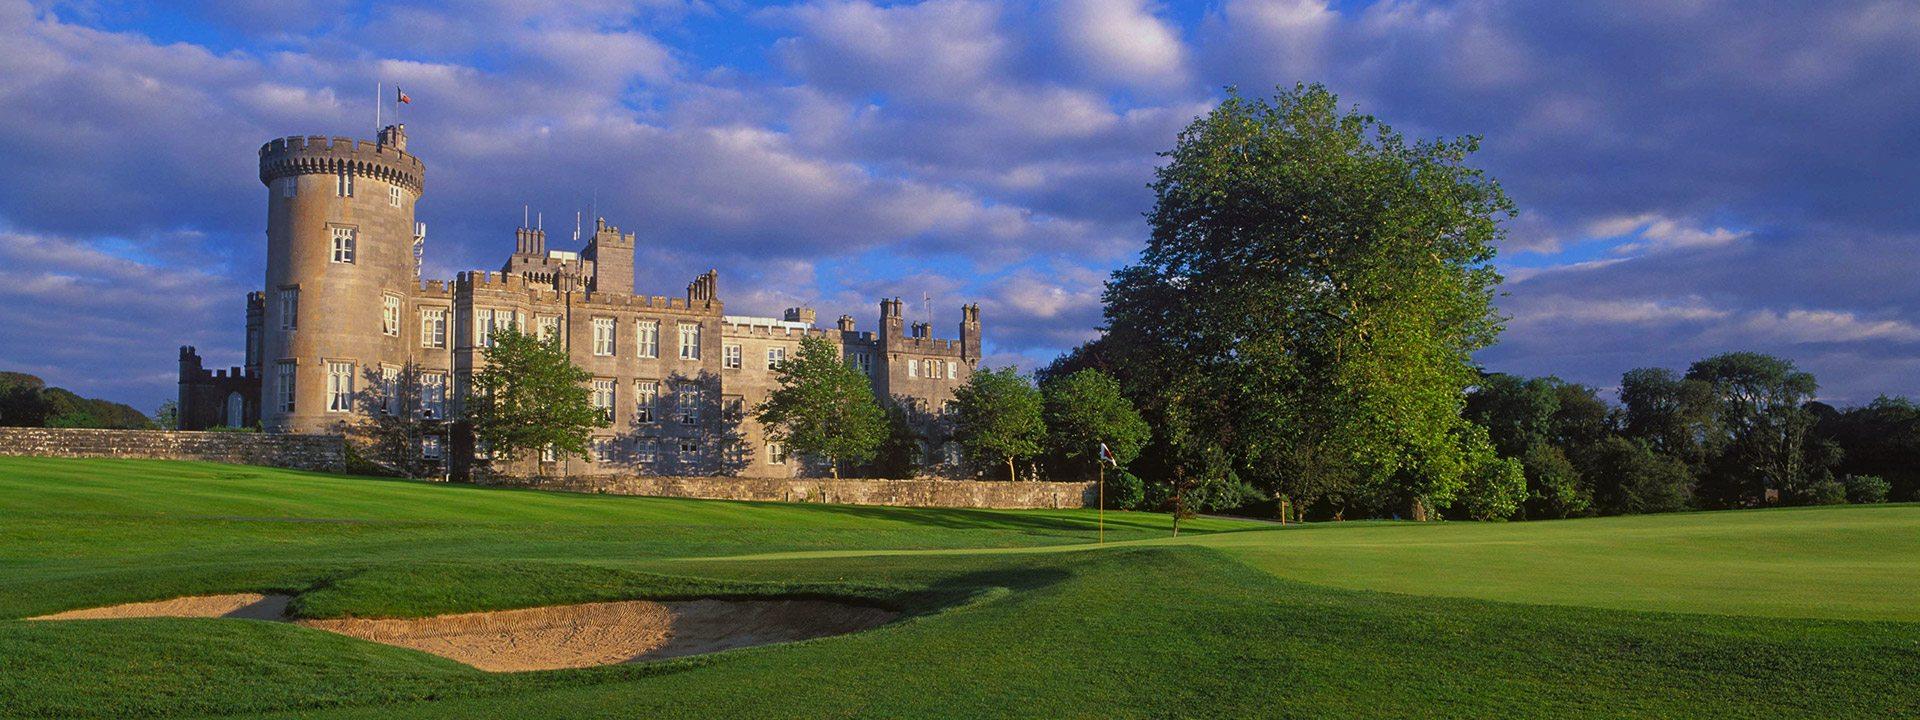 Dromoland Castle Golf Club